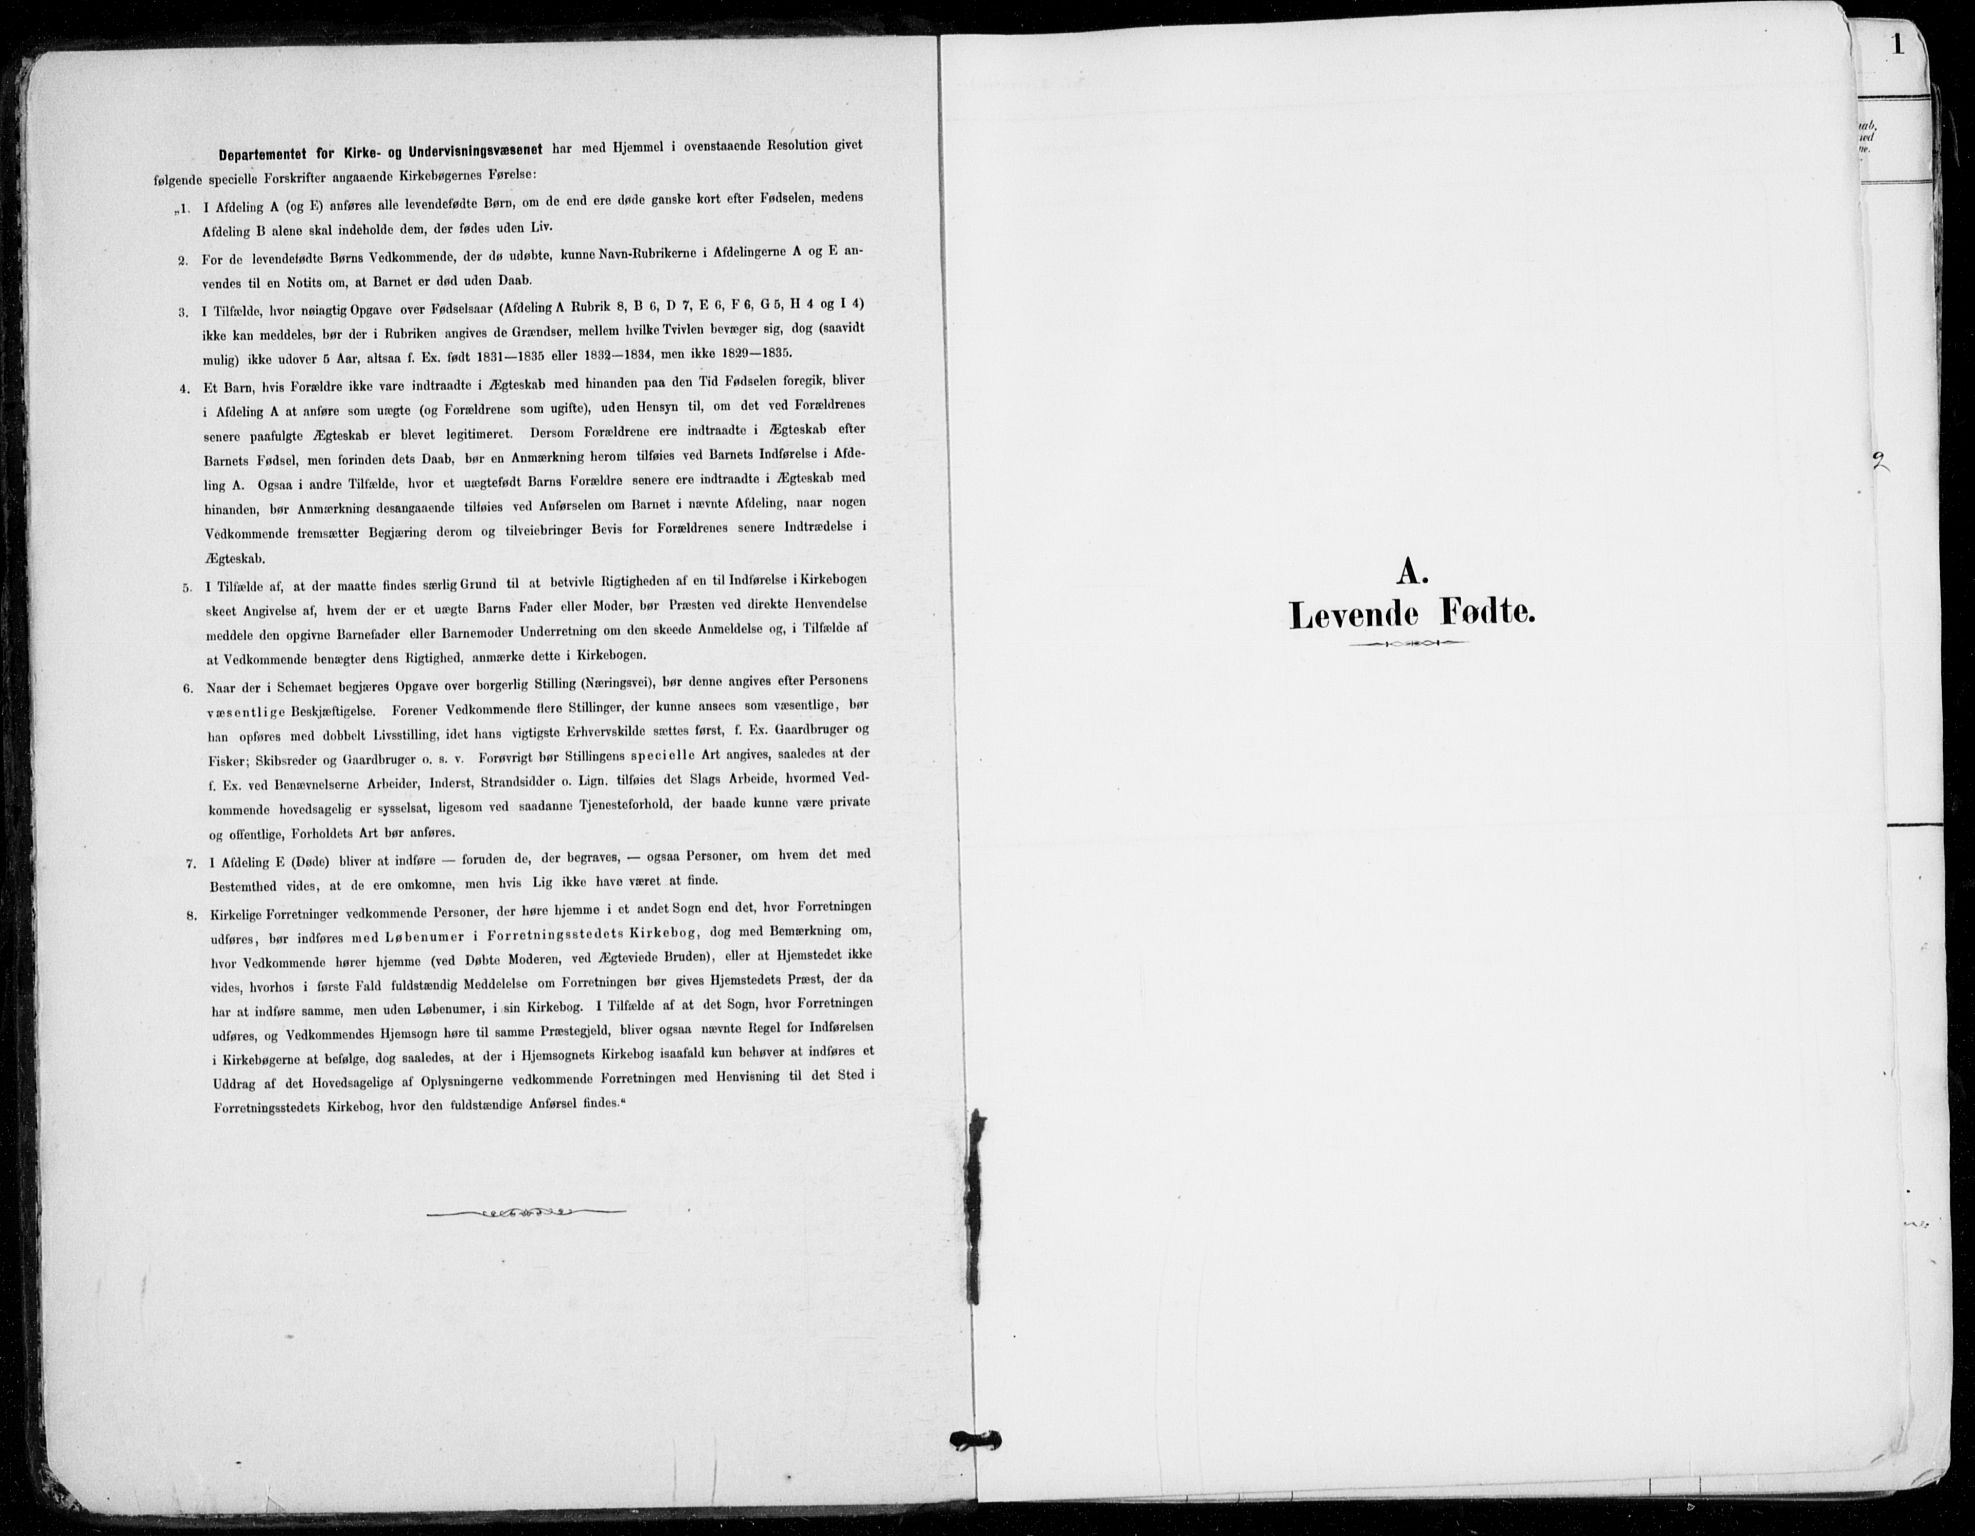 SAKO, Sylling kirkebøker, F/Fa/L0001: Ministerialbok nr. 1, 1883-1910